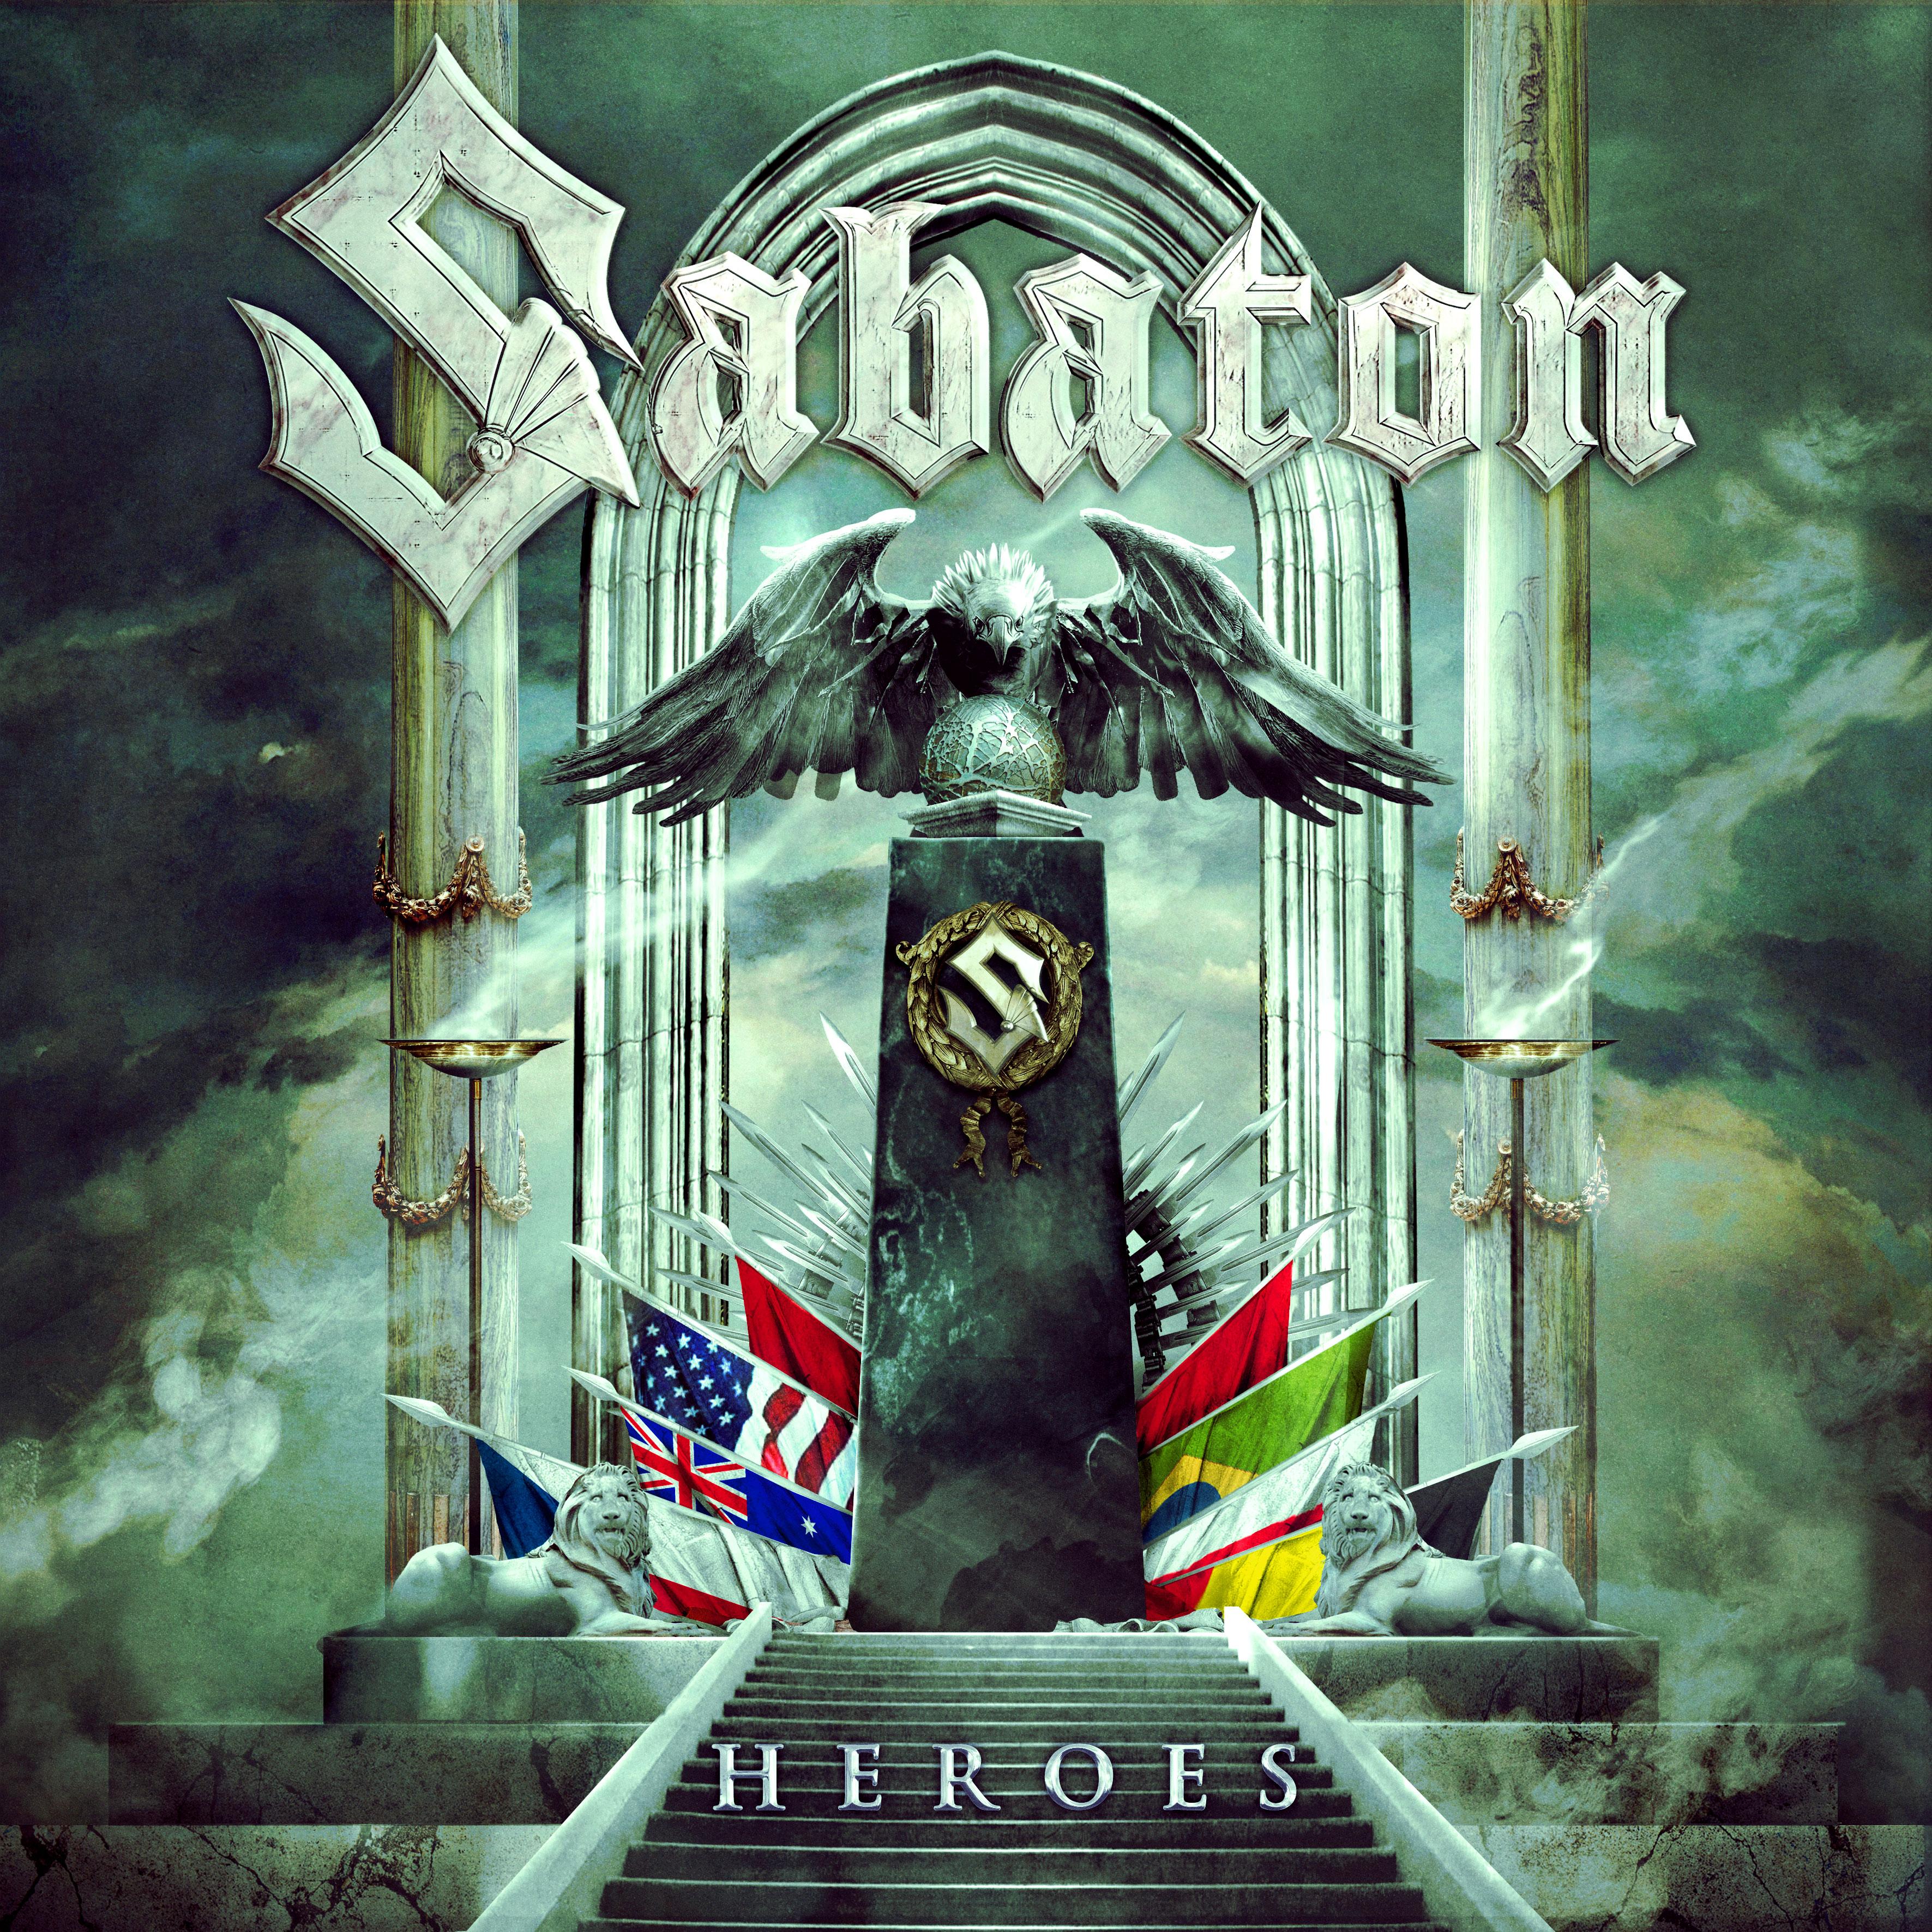 Sabaton - Heroes album cover